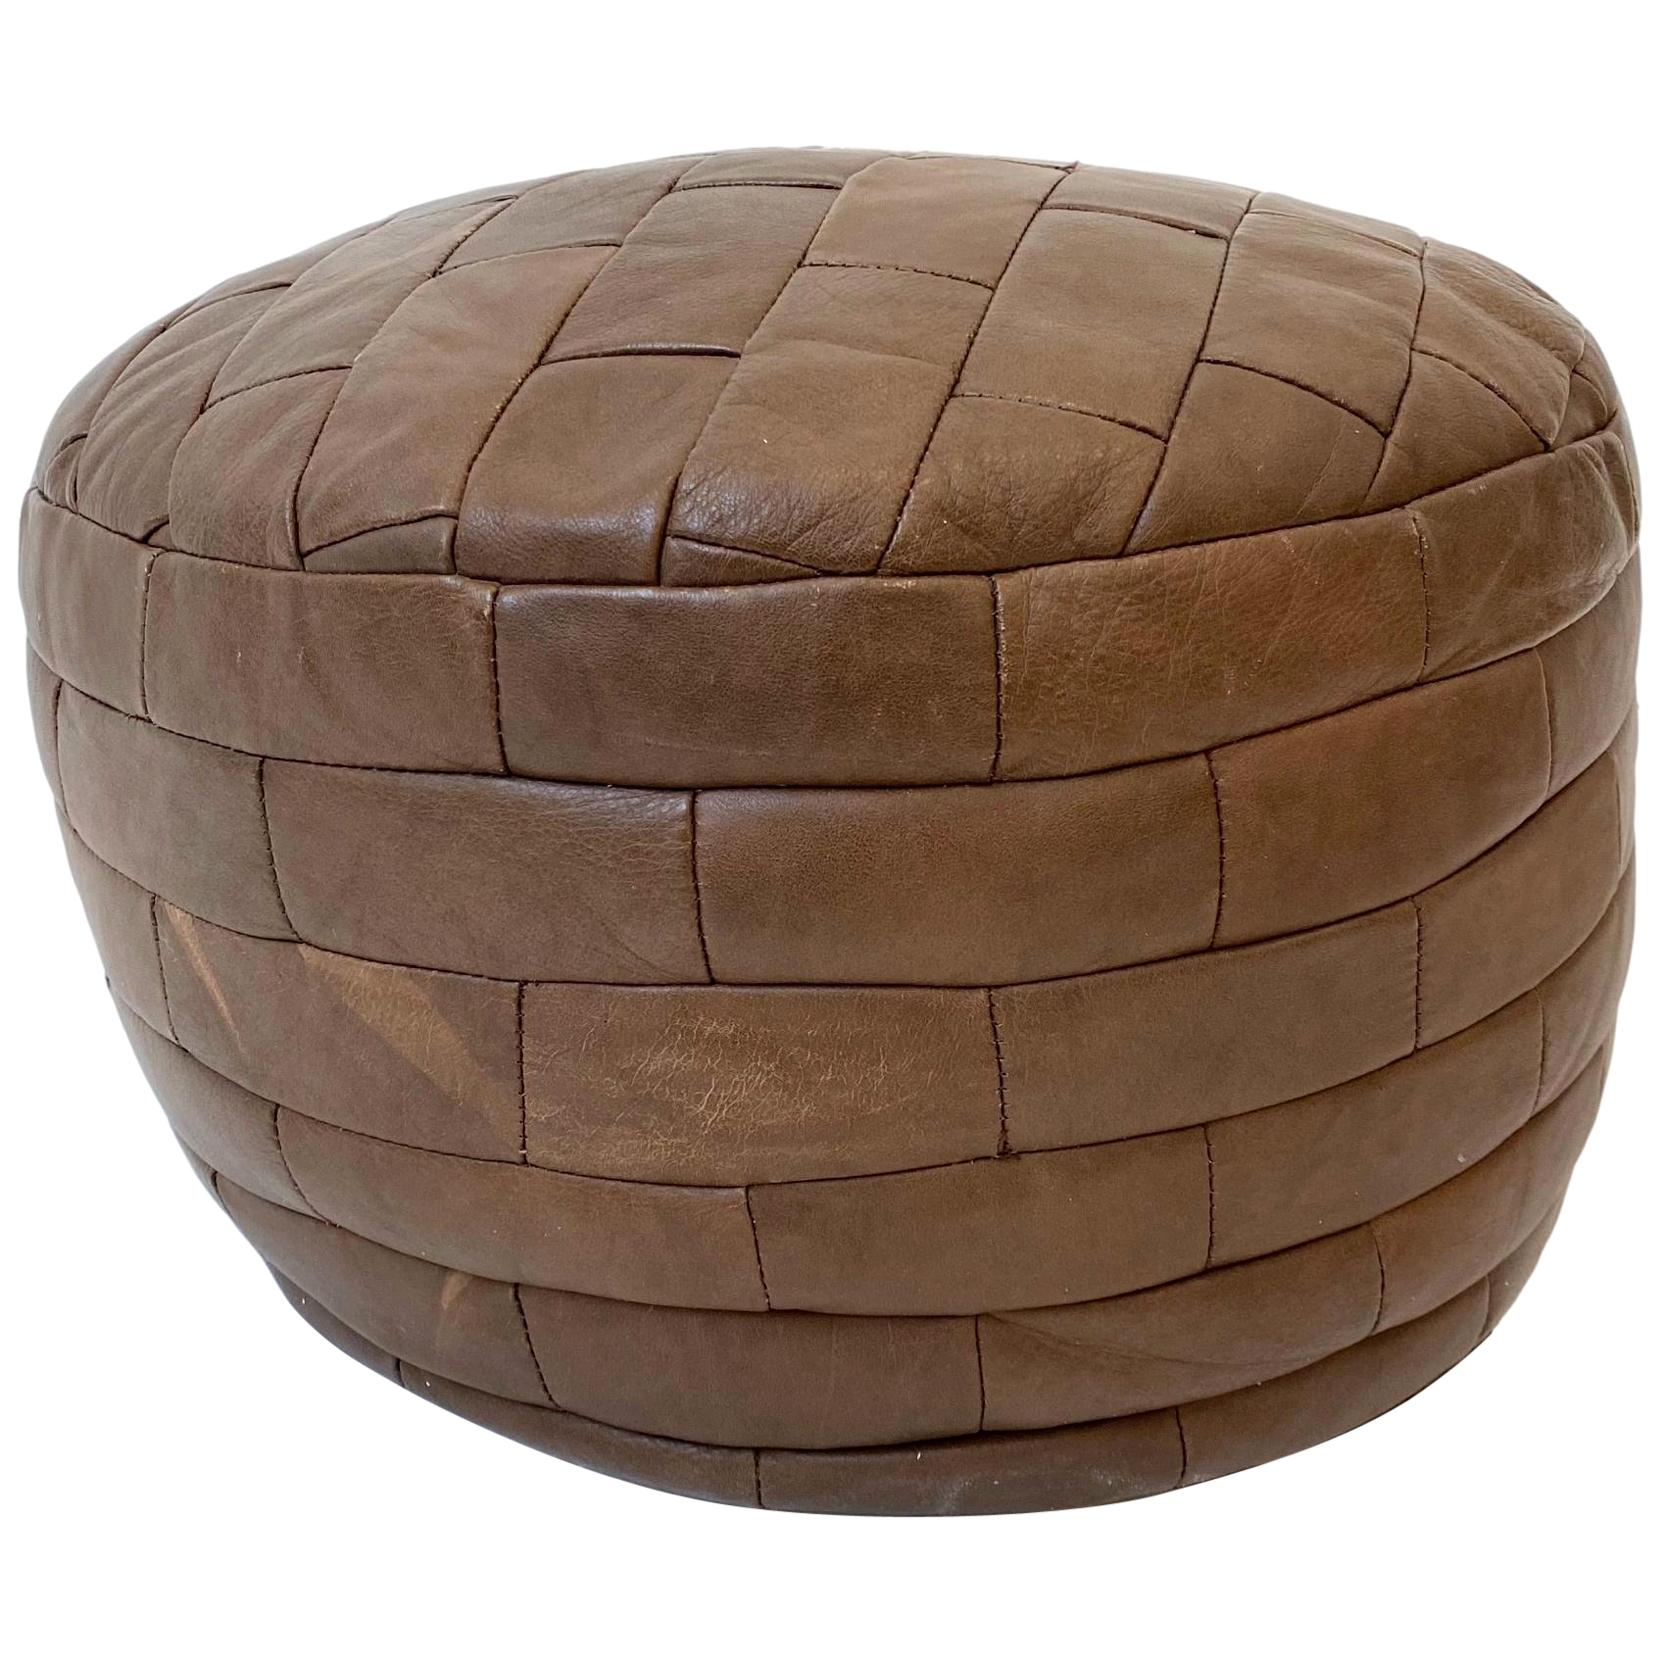 De Sede Patchwork Chocolate Brown Leather Pouf